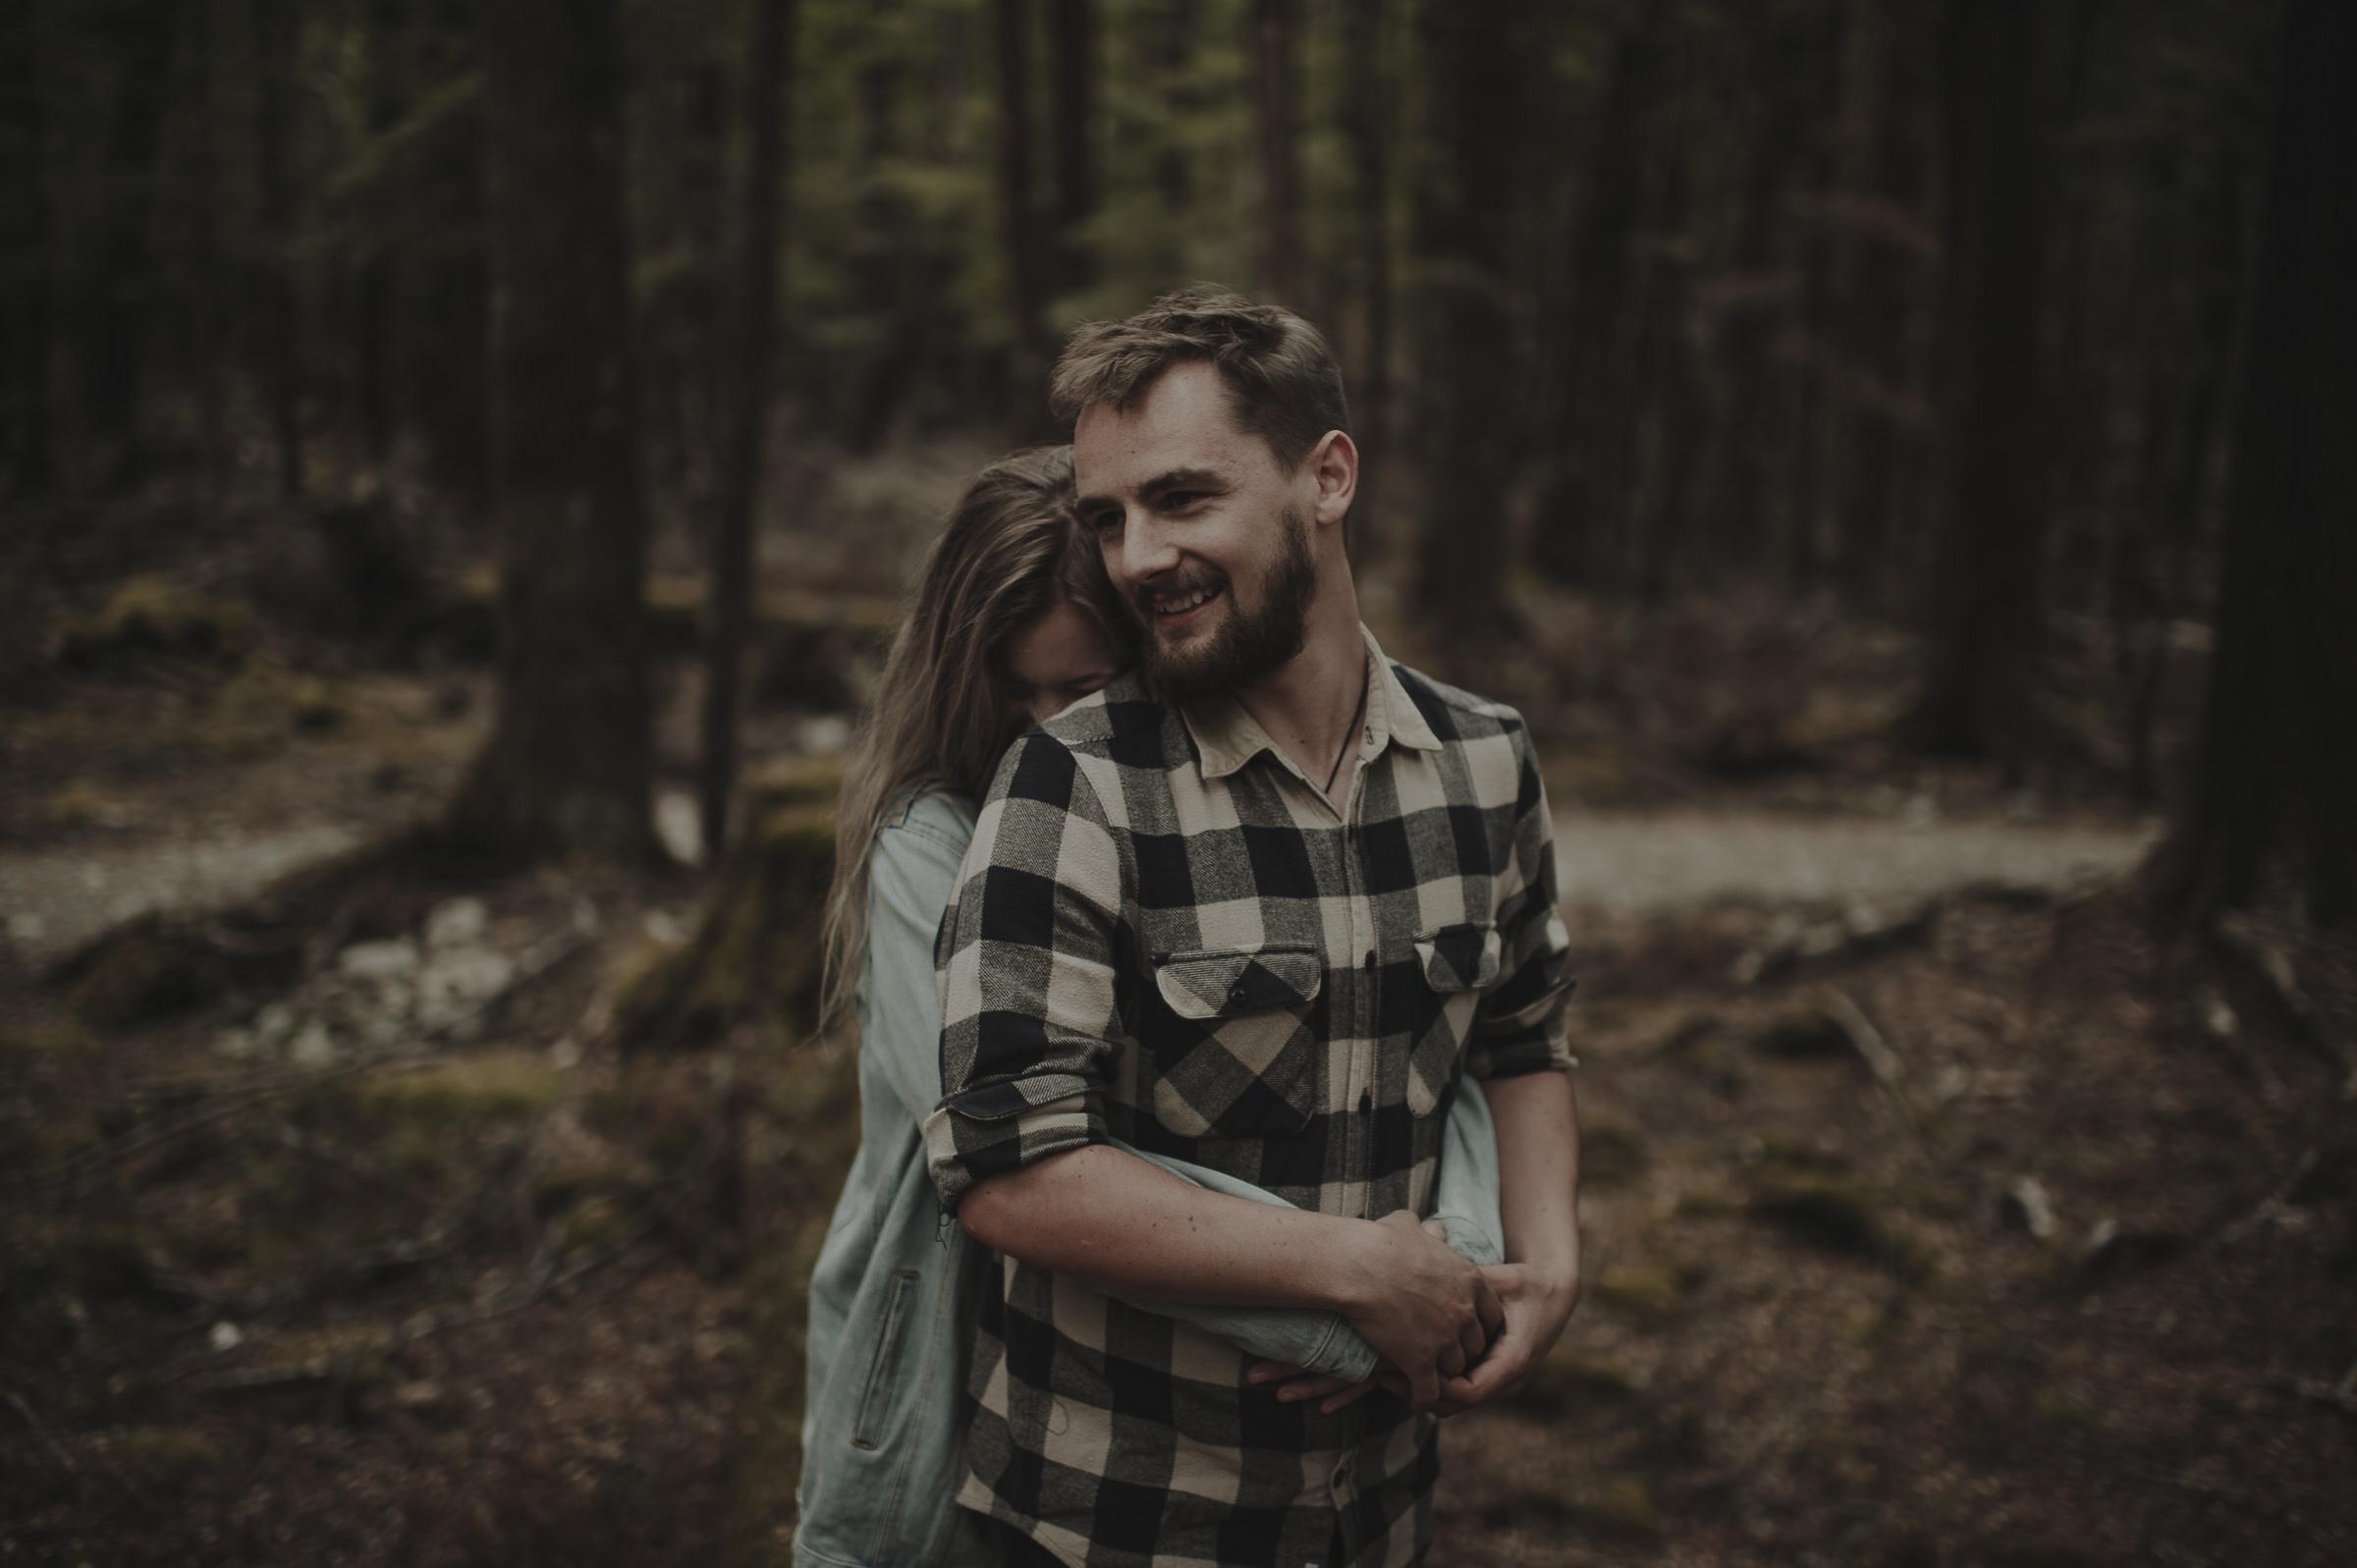 Katie_Hamish_Glenorchy_New_Zealand_Couple_Shoot-40.jpg